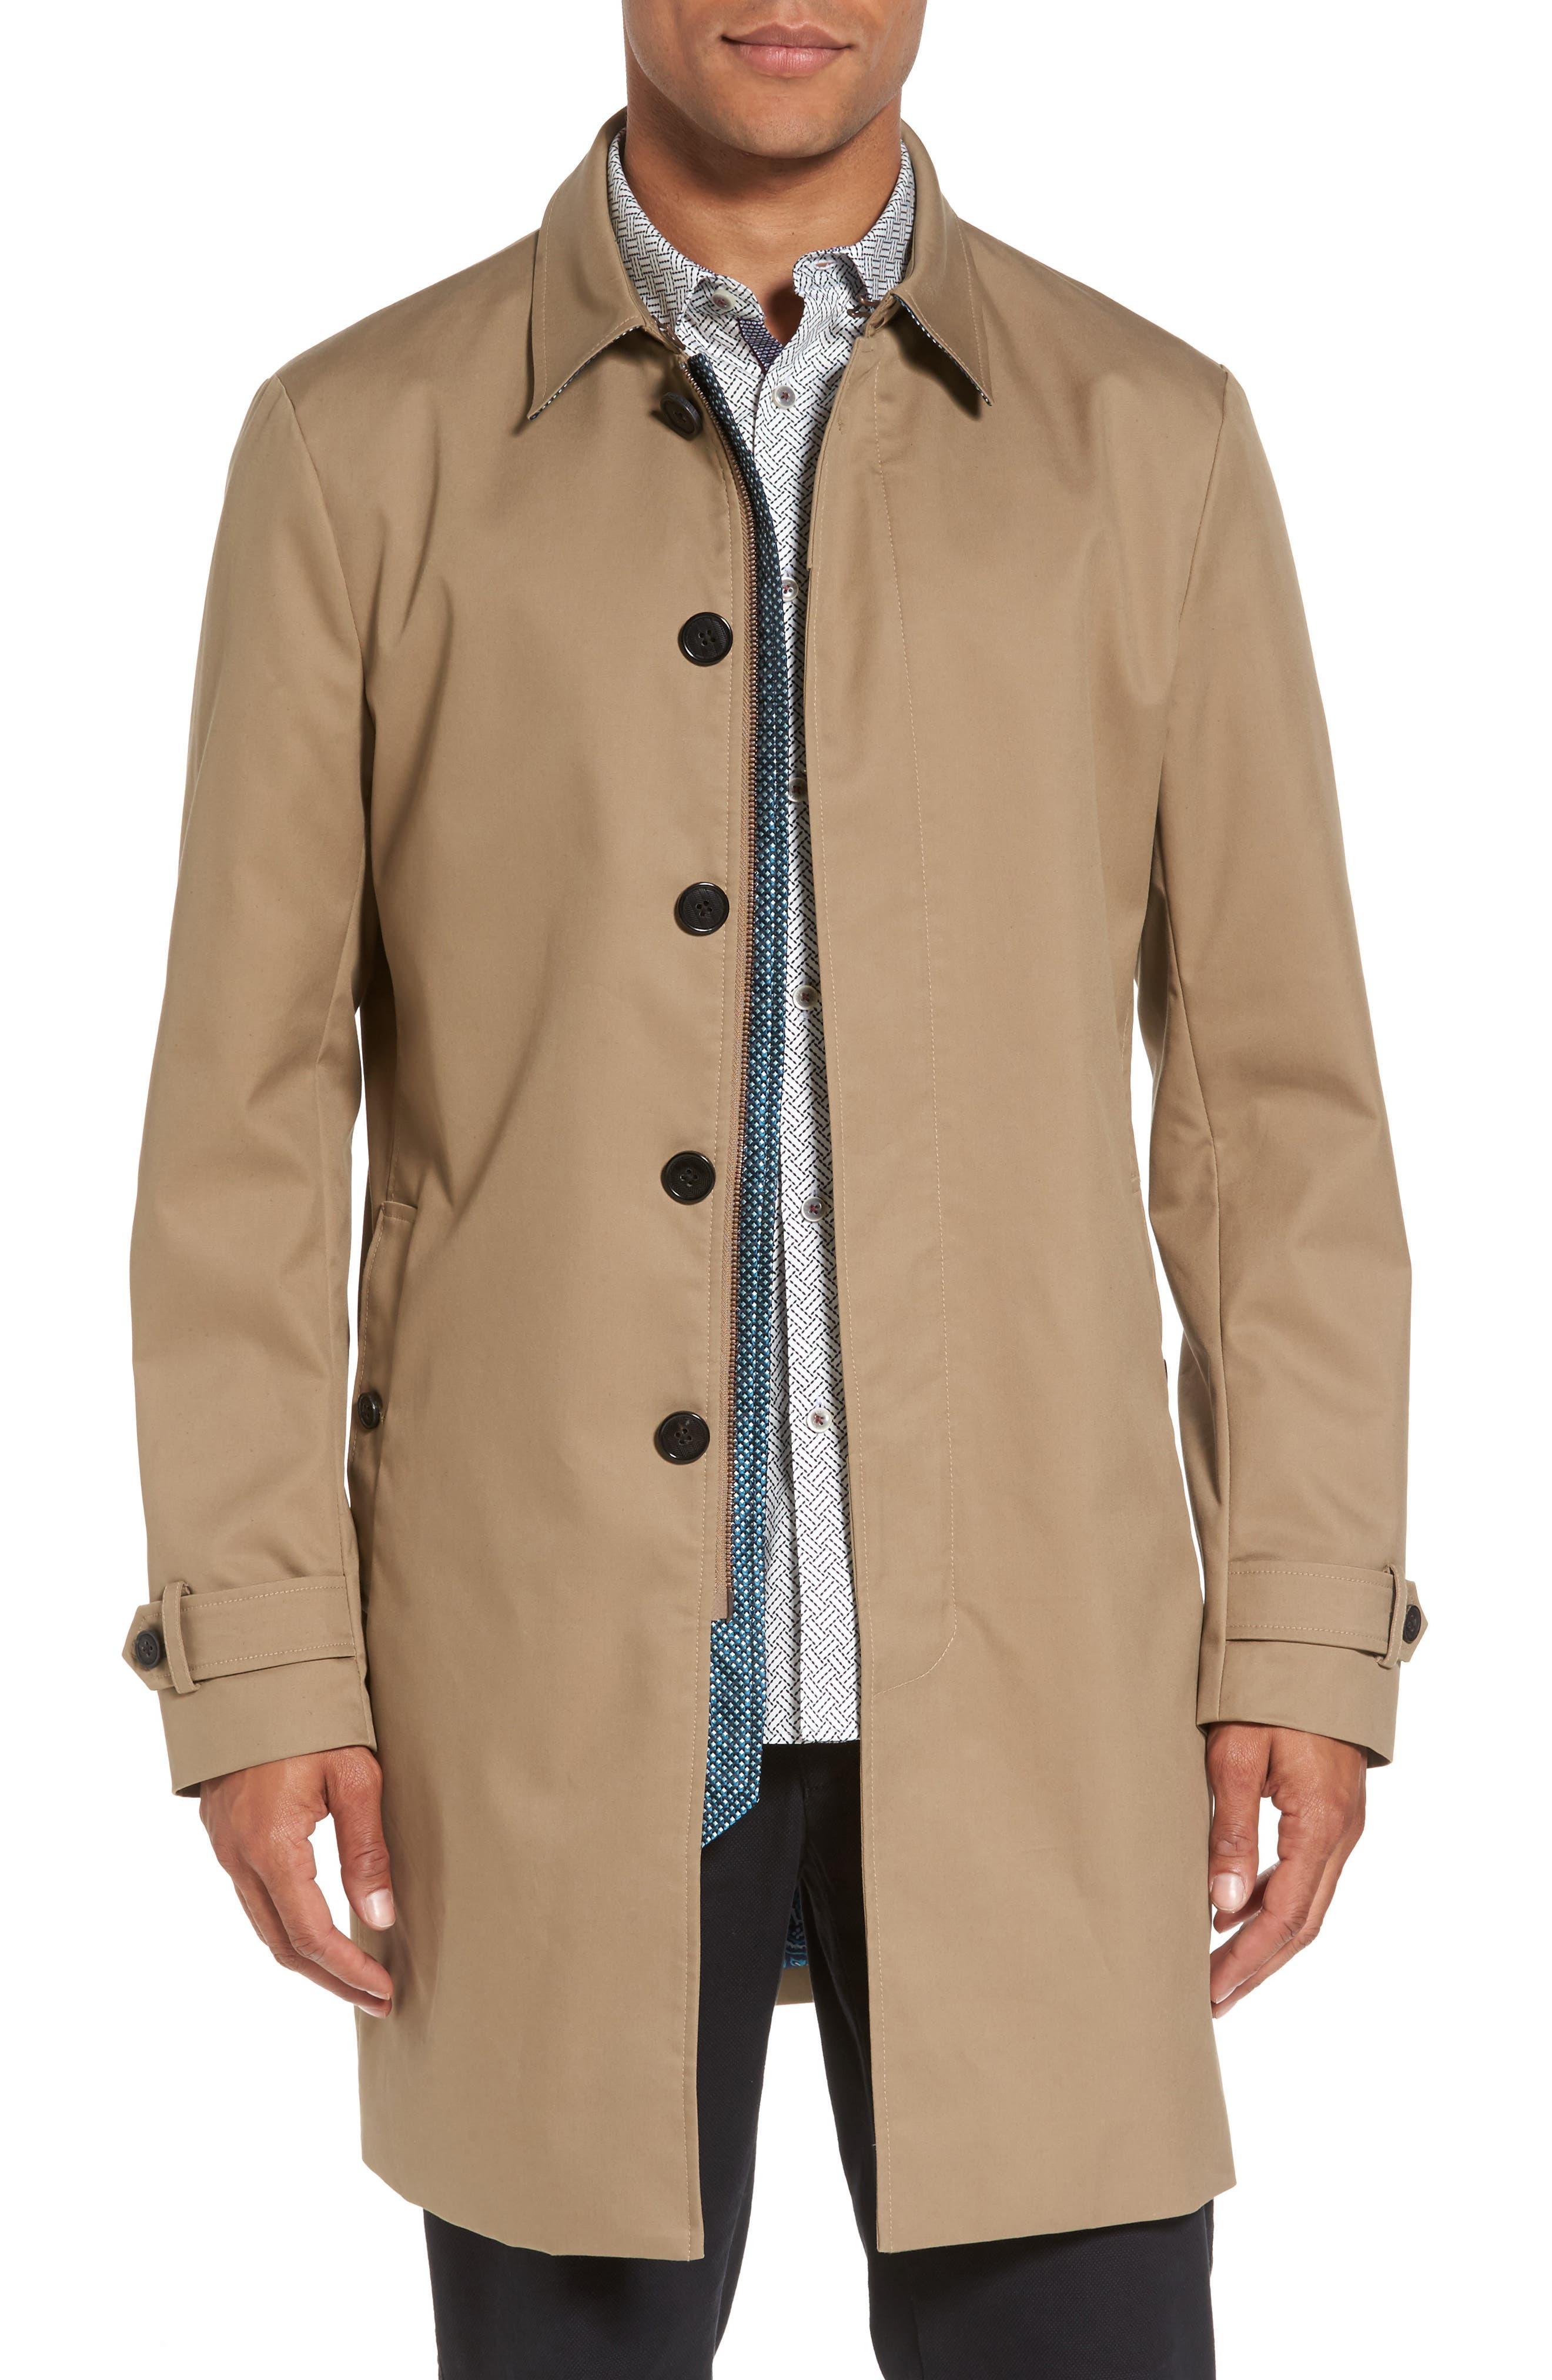 Alternate Image 1 Selected - Ted Baker London Endurance Rain Coat